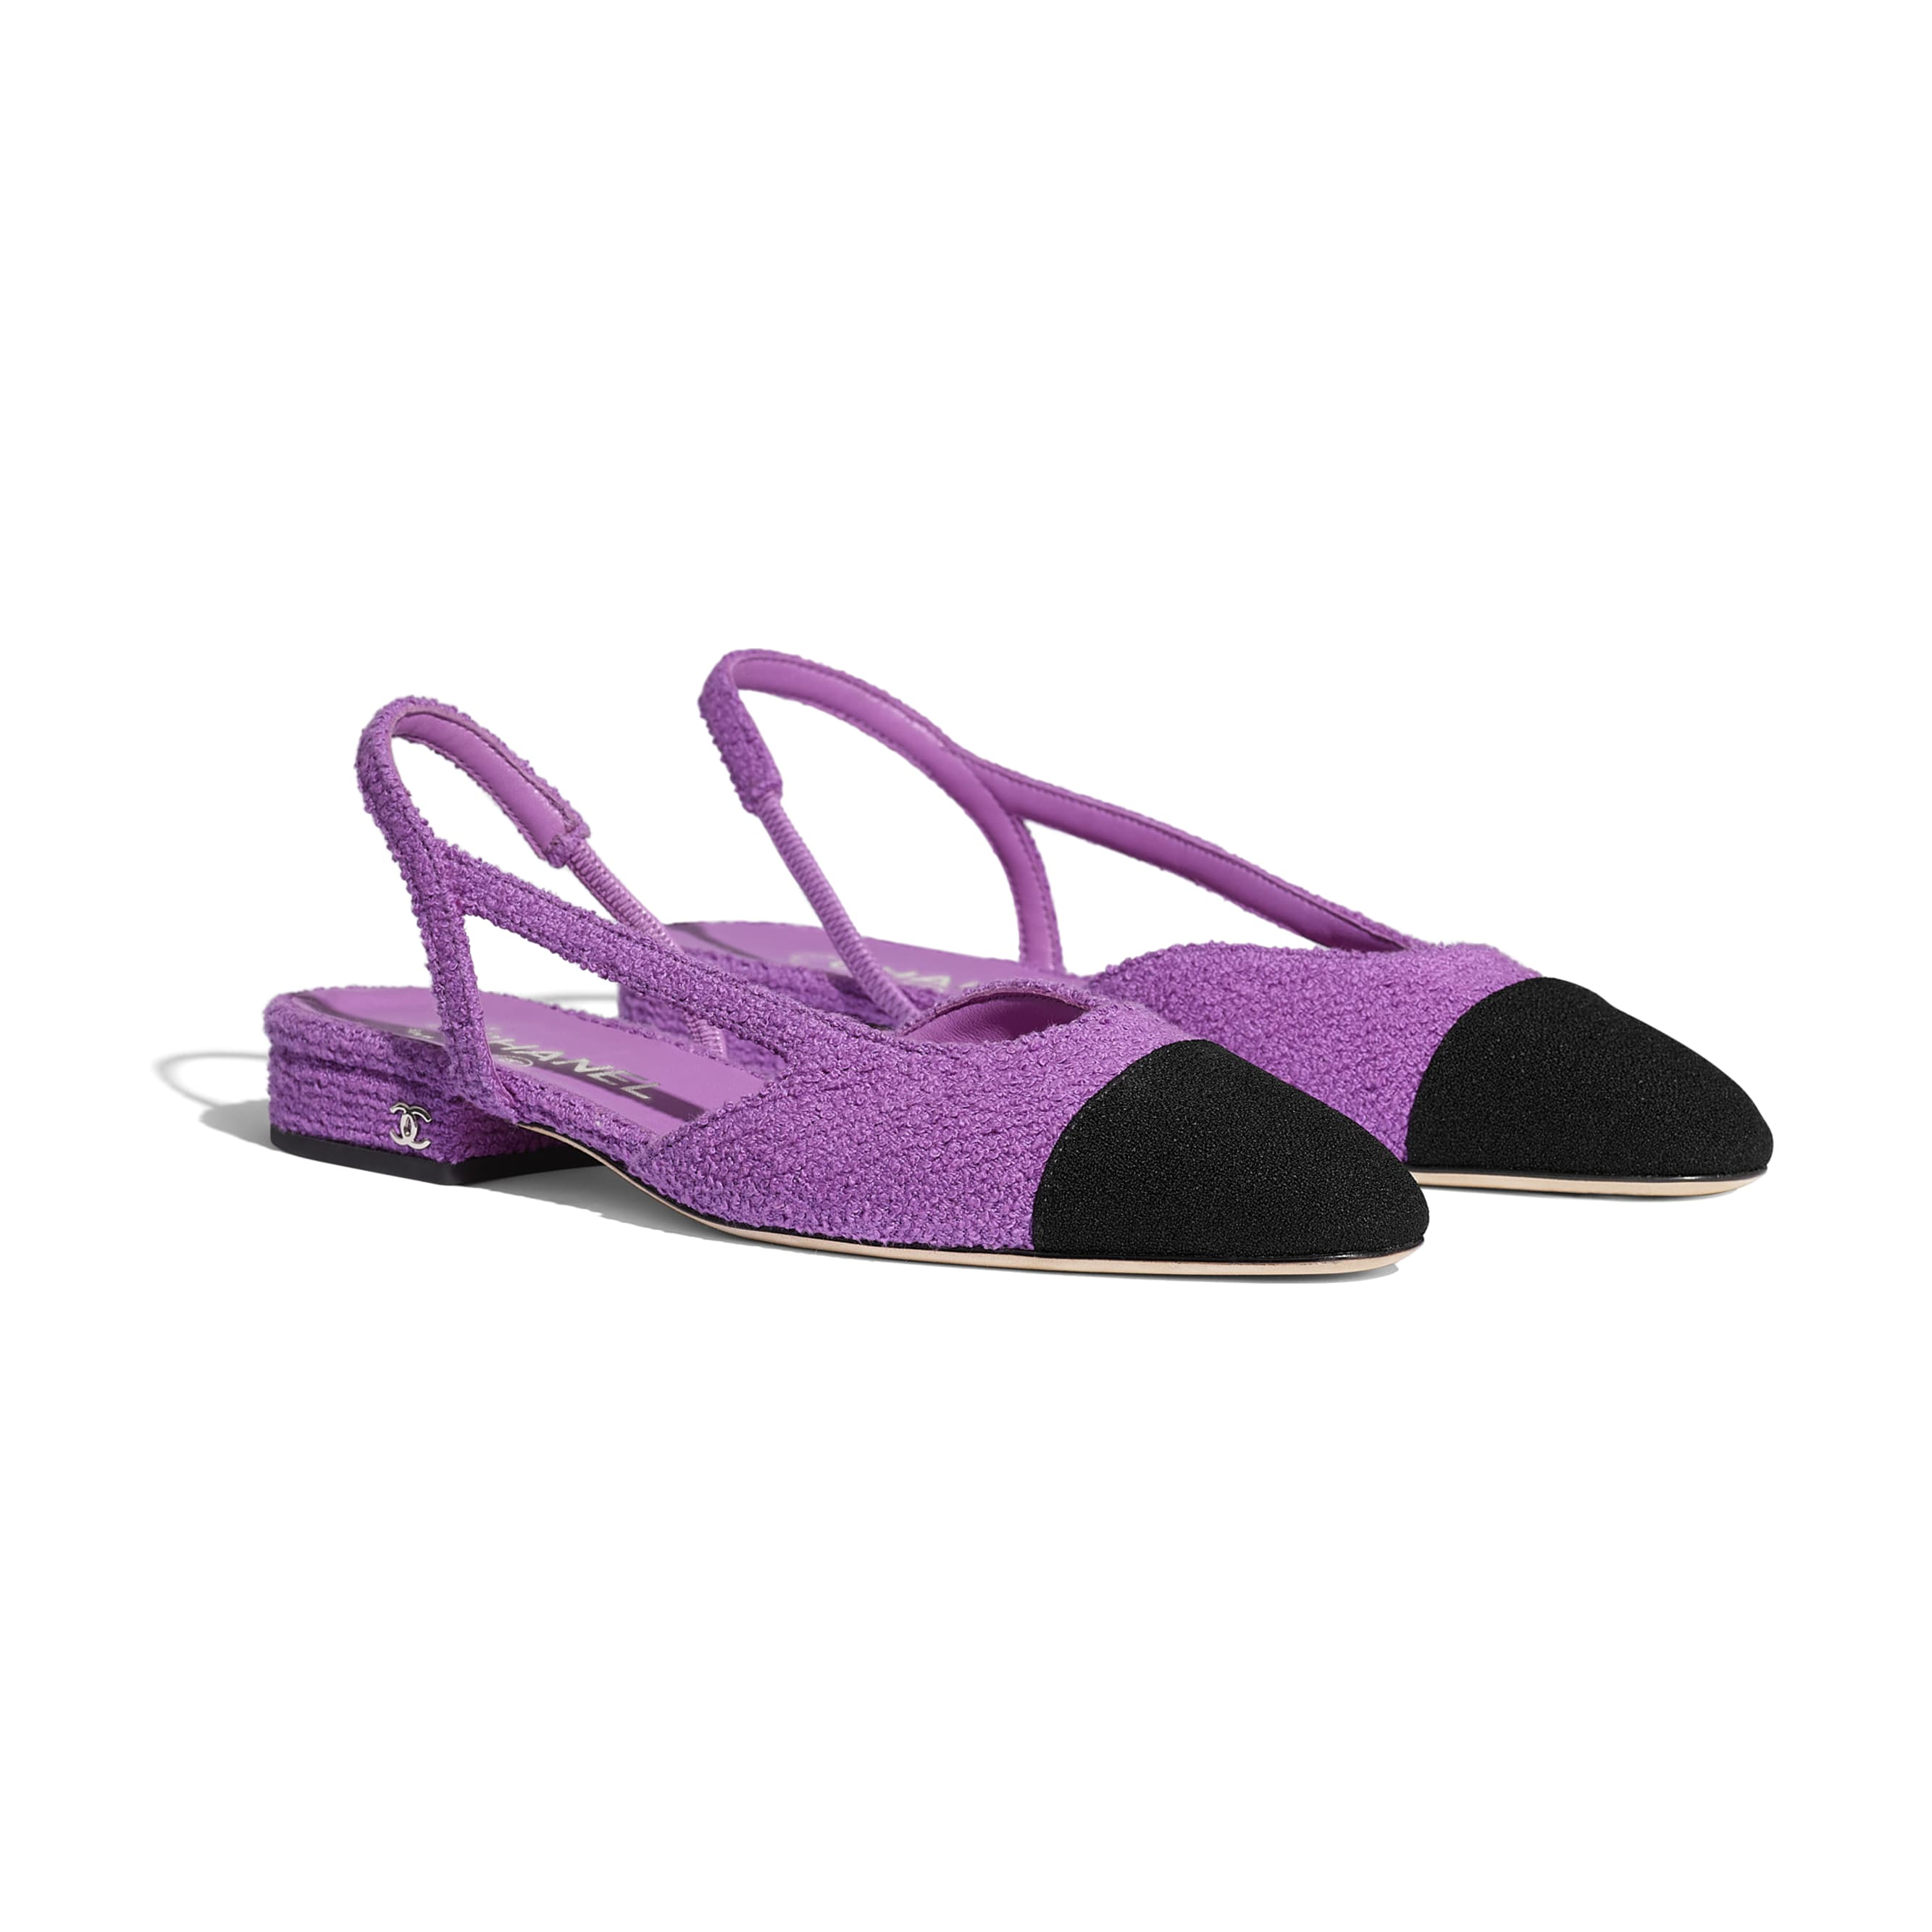 Slingbacks - Purple & Black - Cotton Tweed - CHANEL - Alternative view - see standard sized version